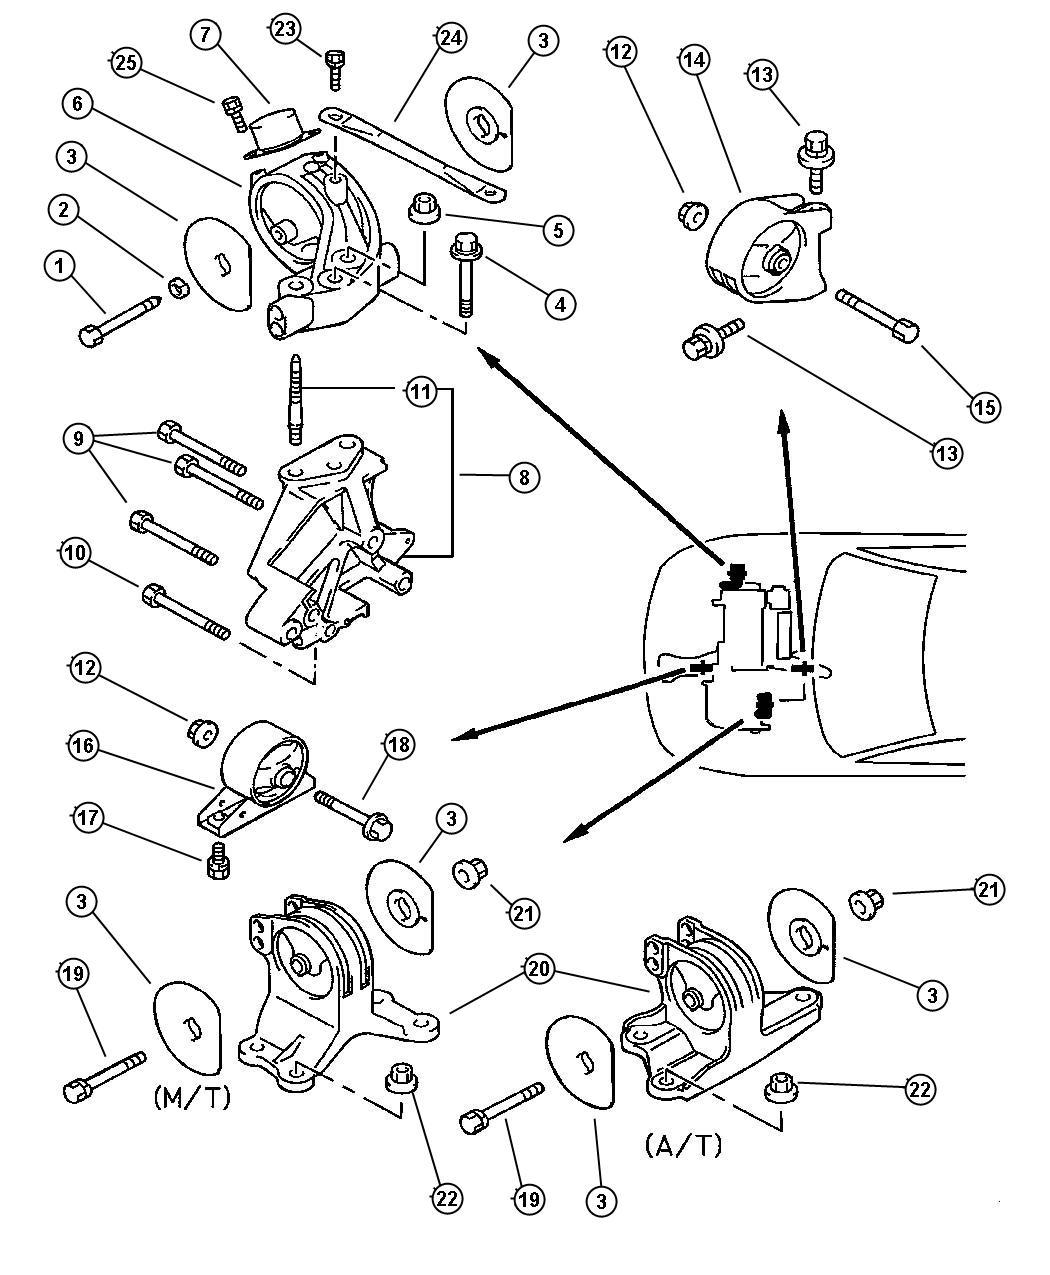 [DIAGRAM] 2015 Dodge Stratus Manual Transmission Diagram